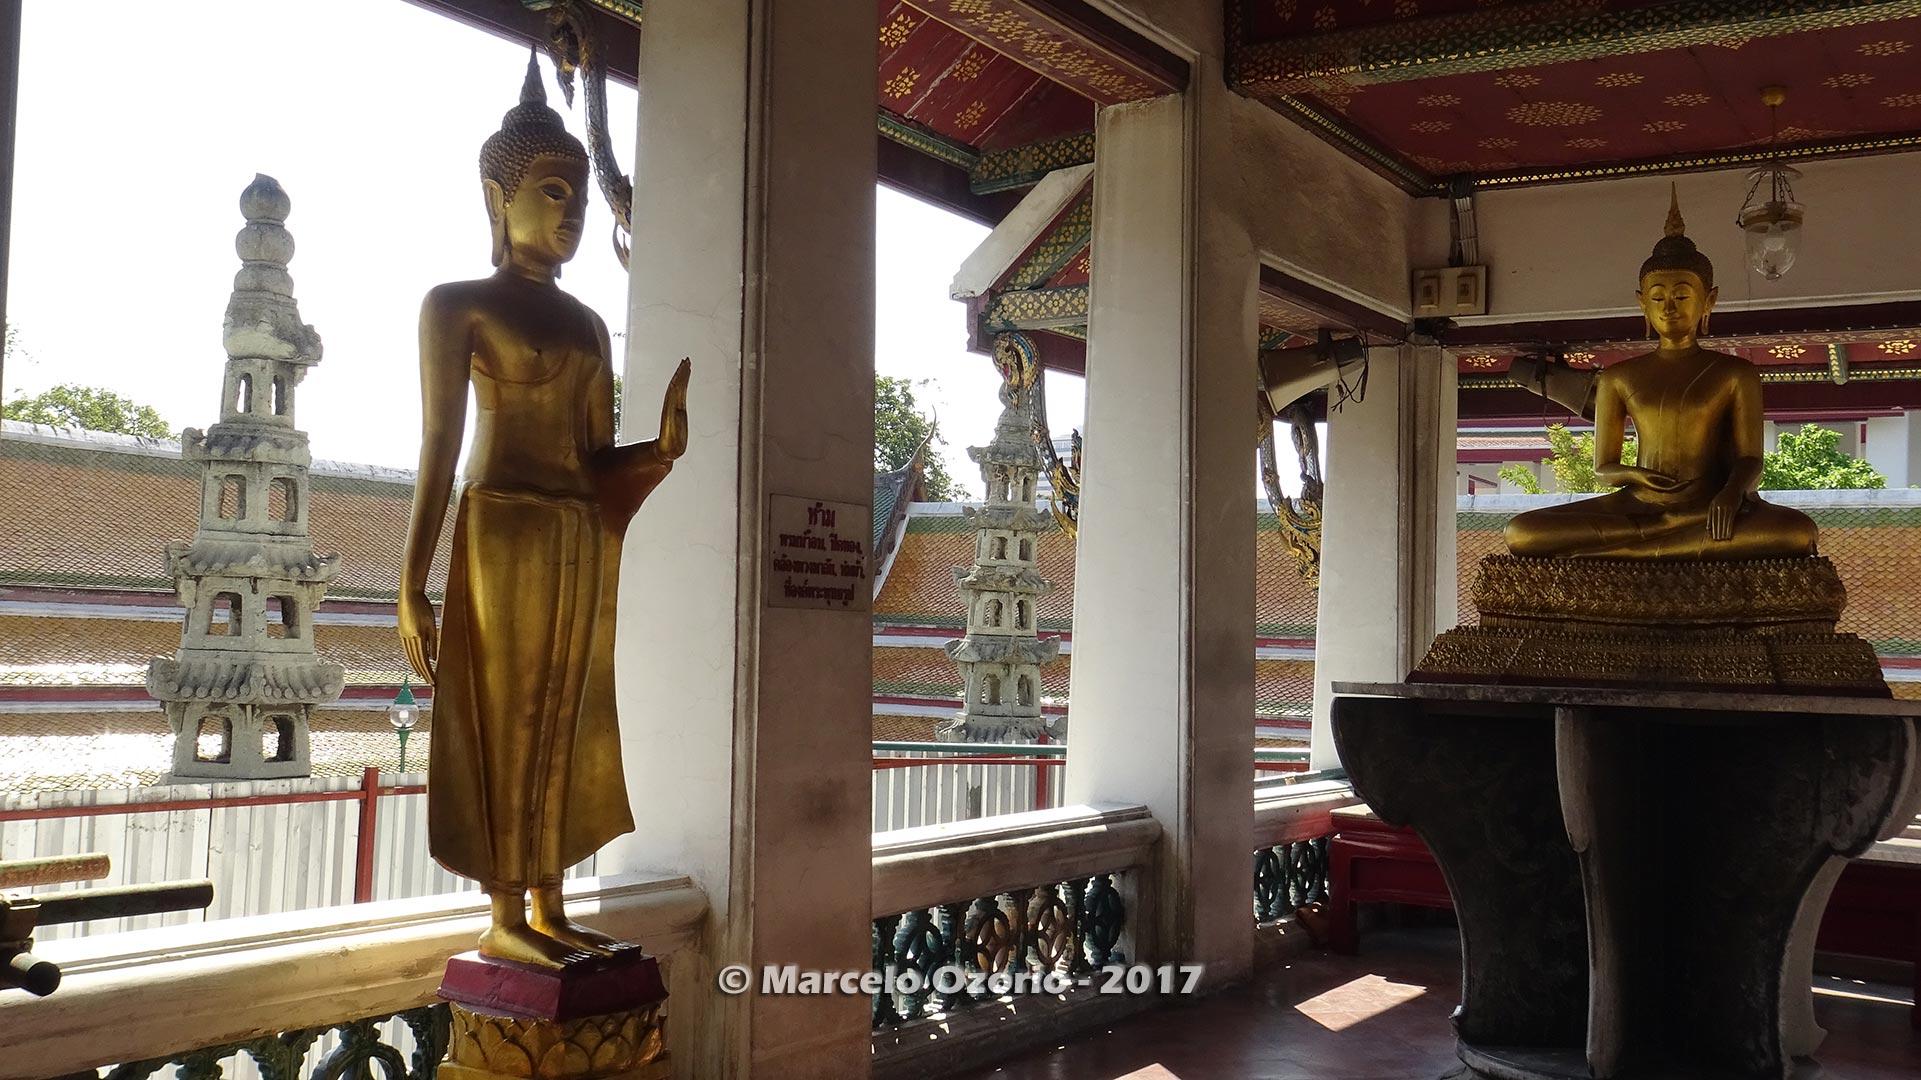 budhas bangkok thailand serie 12 - Buddhas of Bangkok - Thailand